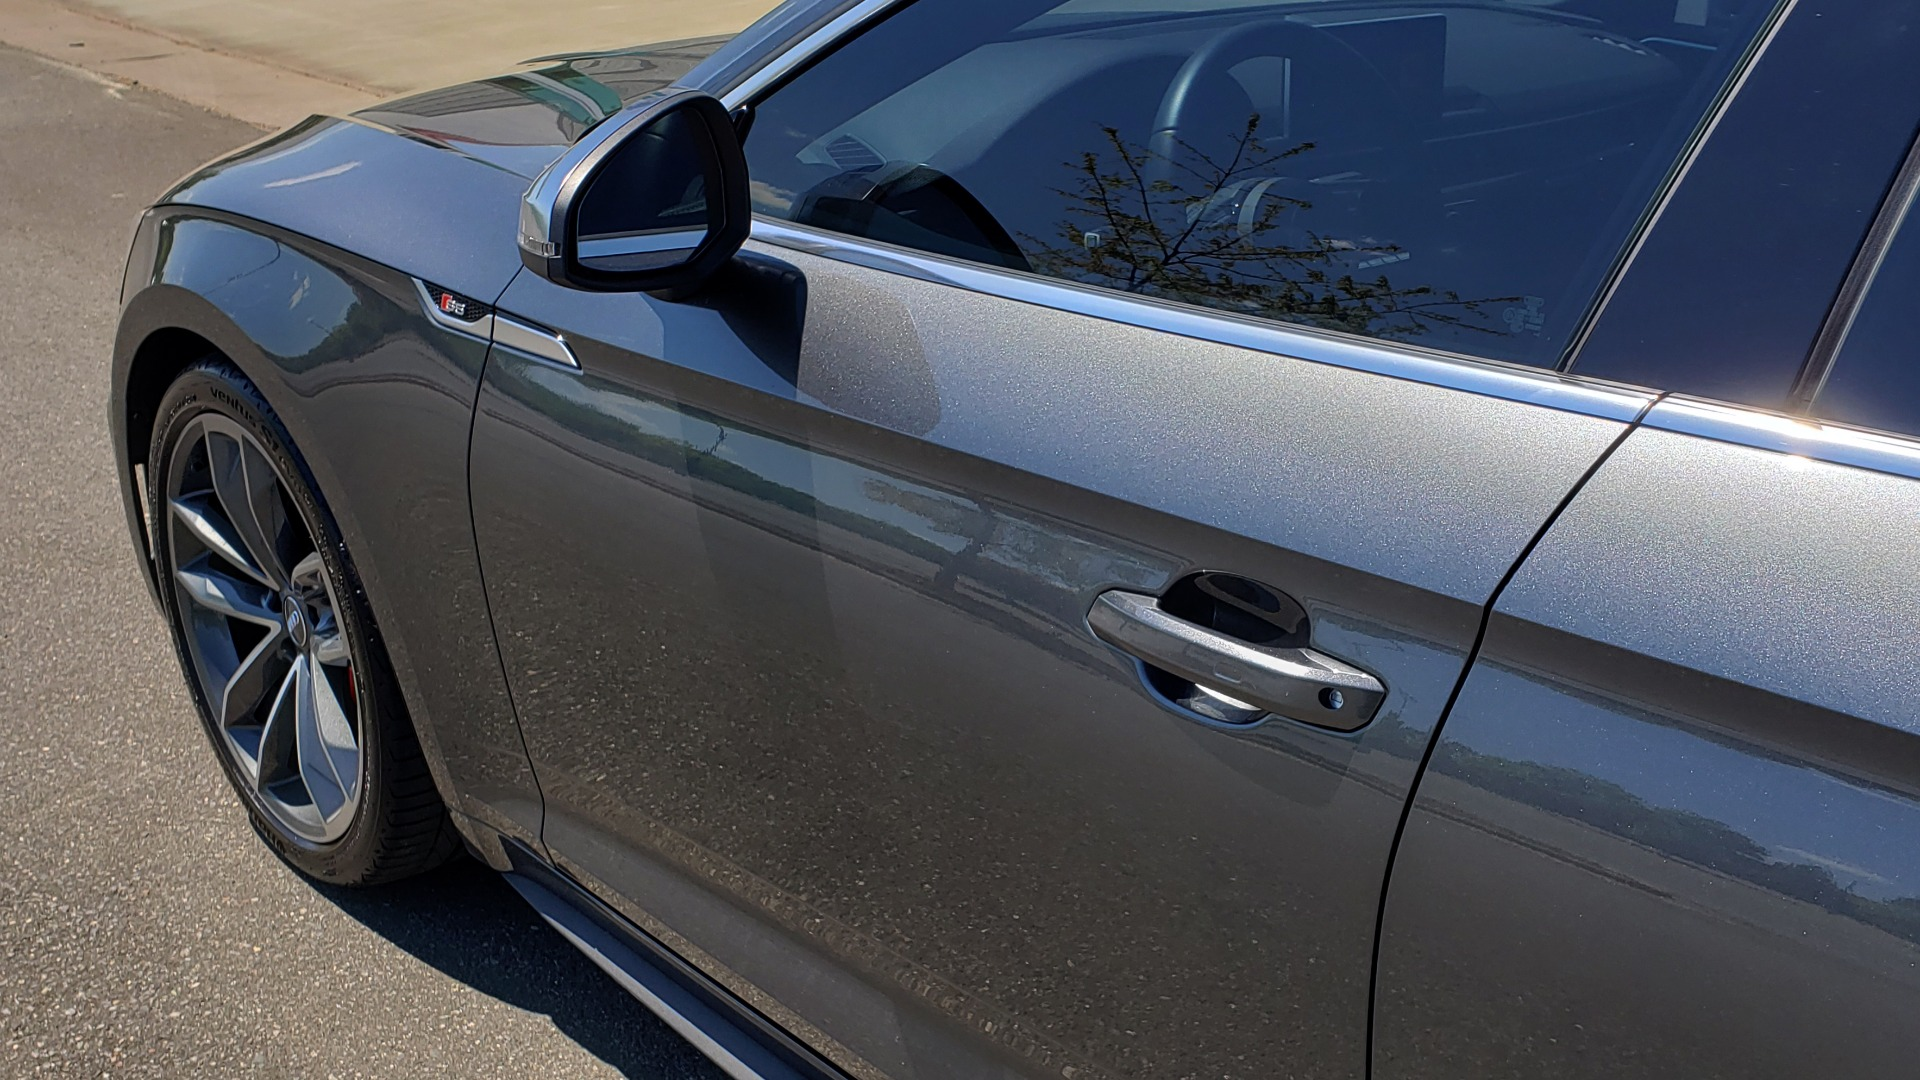 Used 2018 Audi S5 SPORTBACK PRESTIGE S-SPORT / NAV / SUNROOF / HUD / B&O SND / REARVIEW for sale $48,995 at Formula Imports in Charlotte NC 28227 6